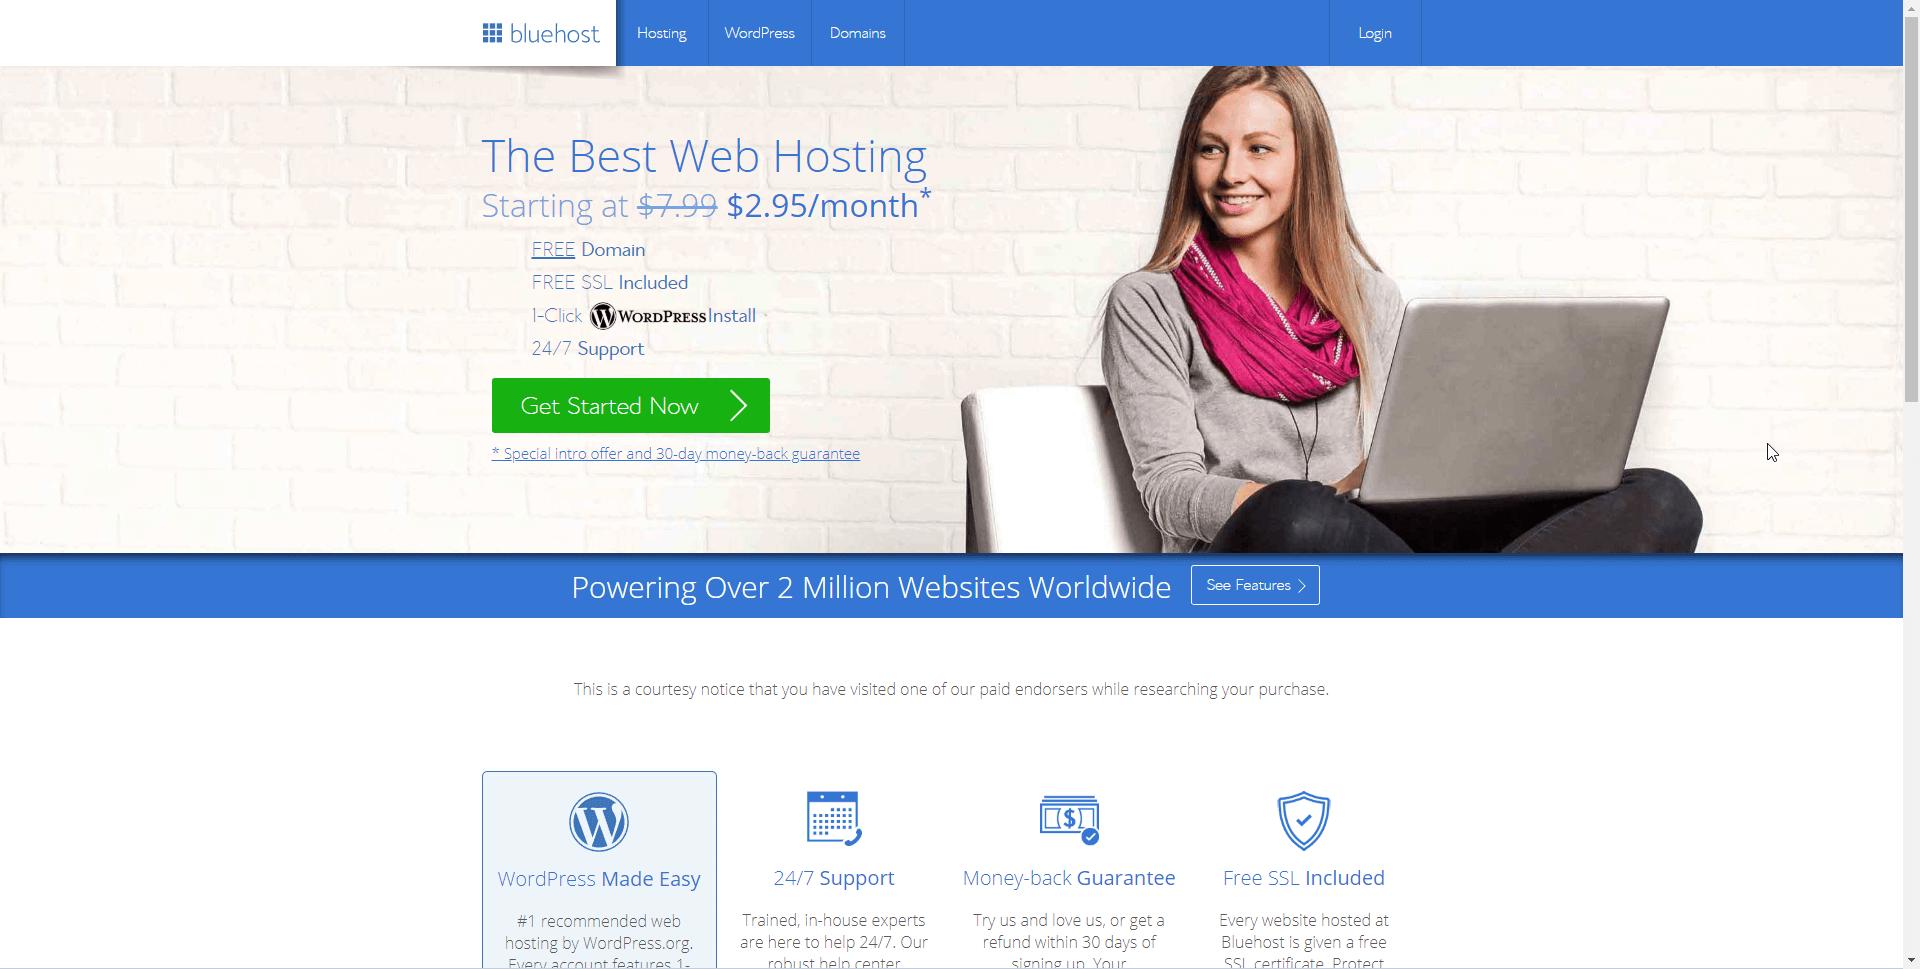 موقع ويب bluehost.com